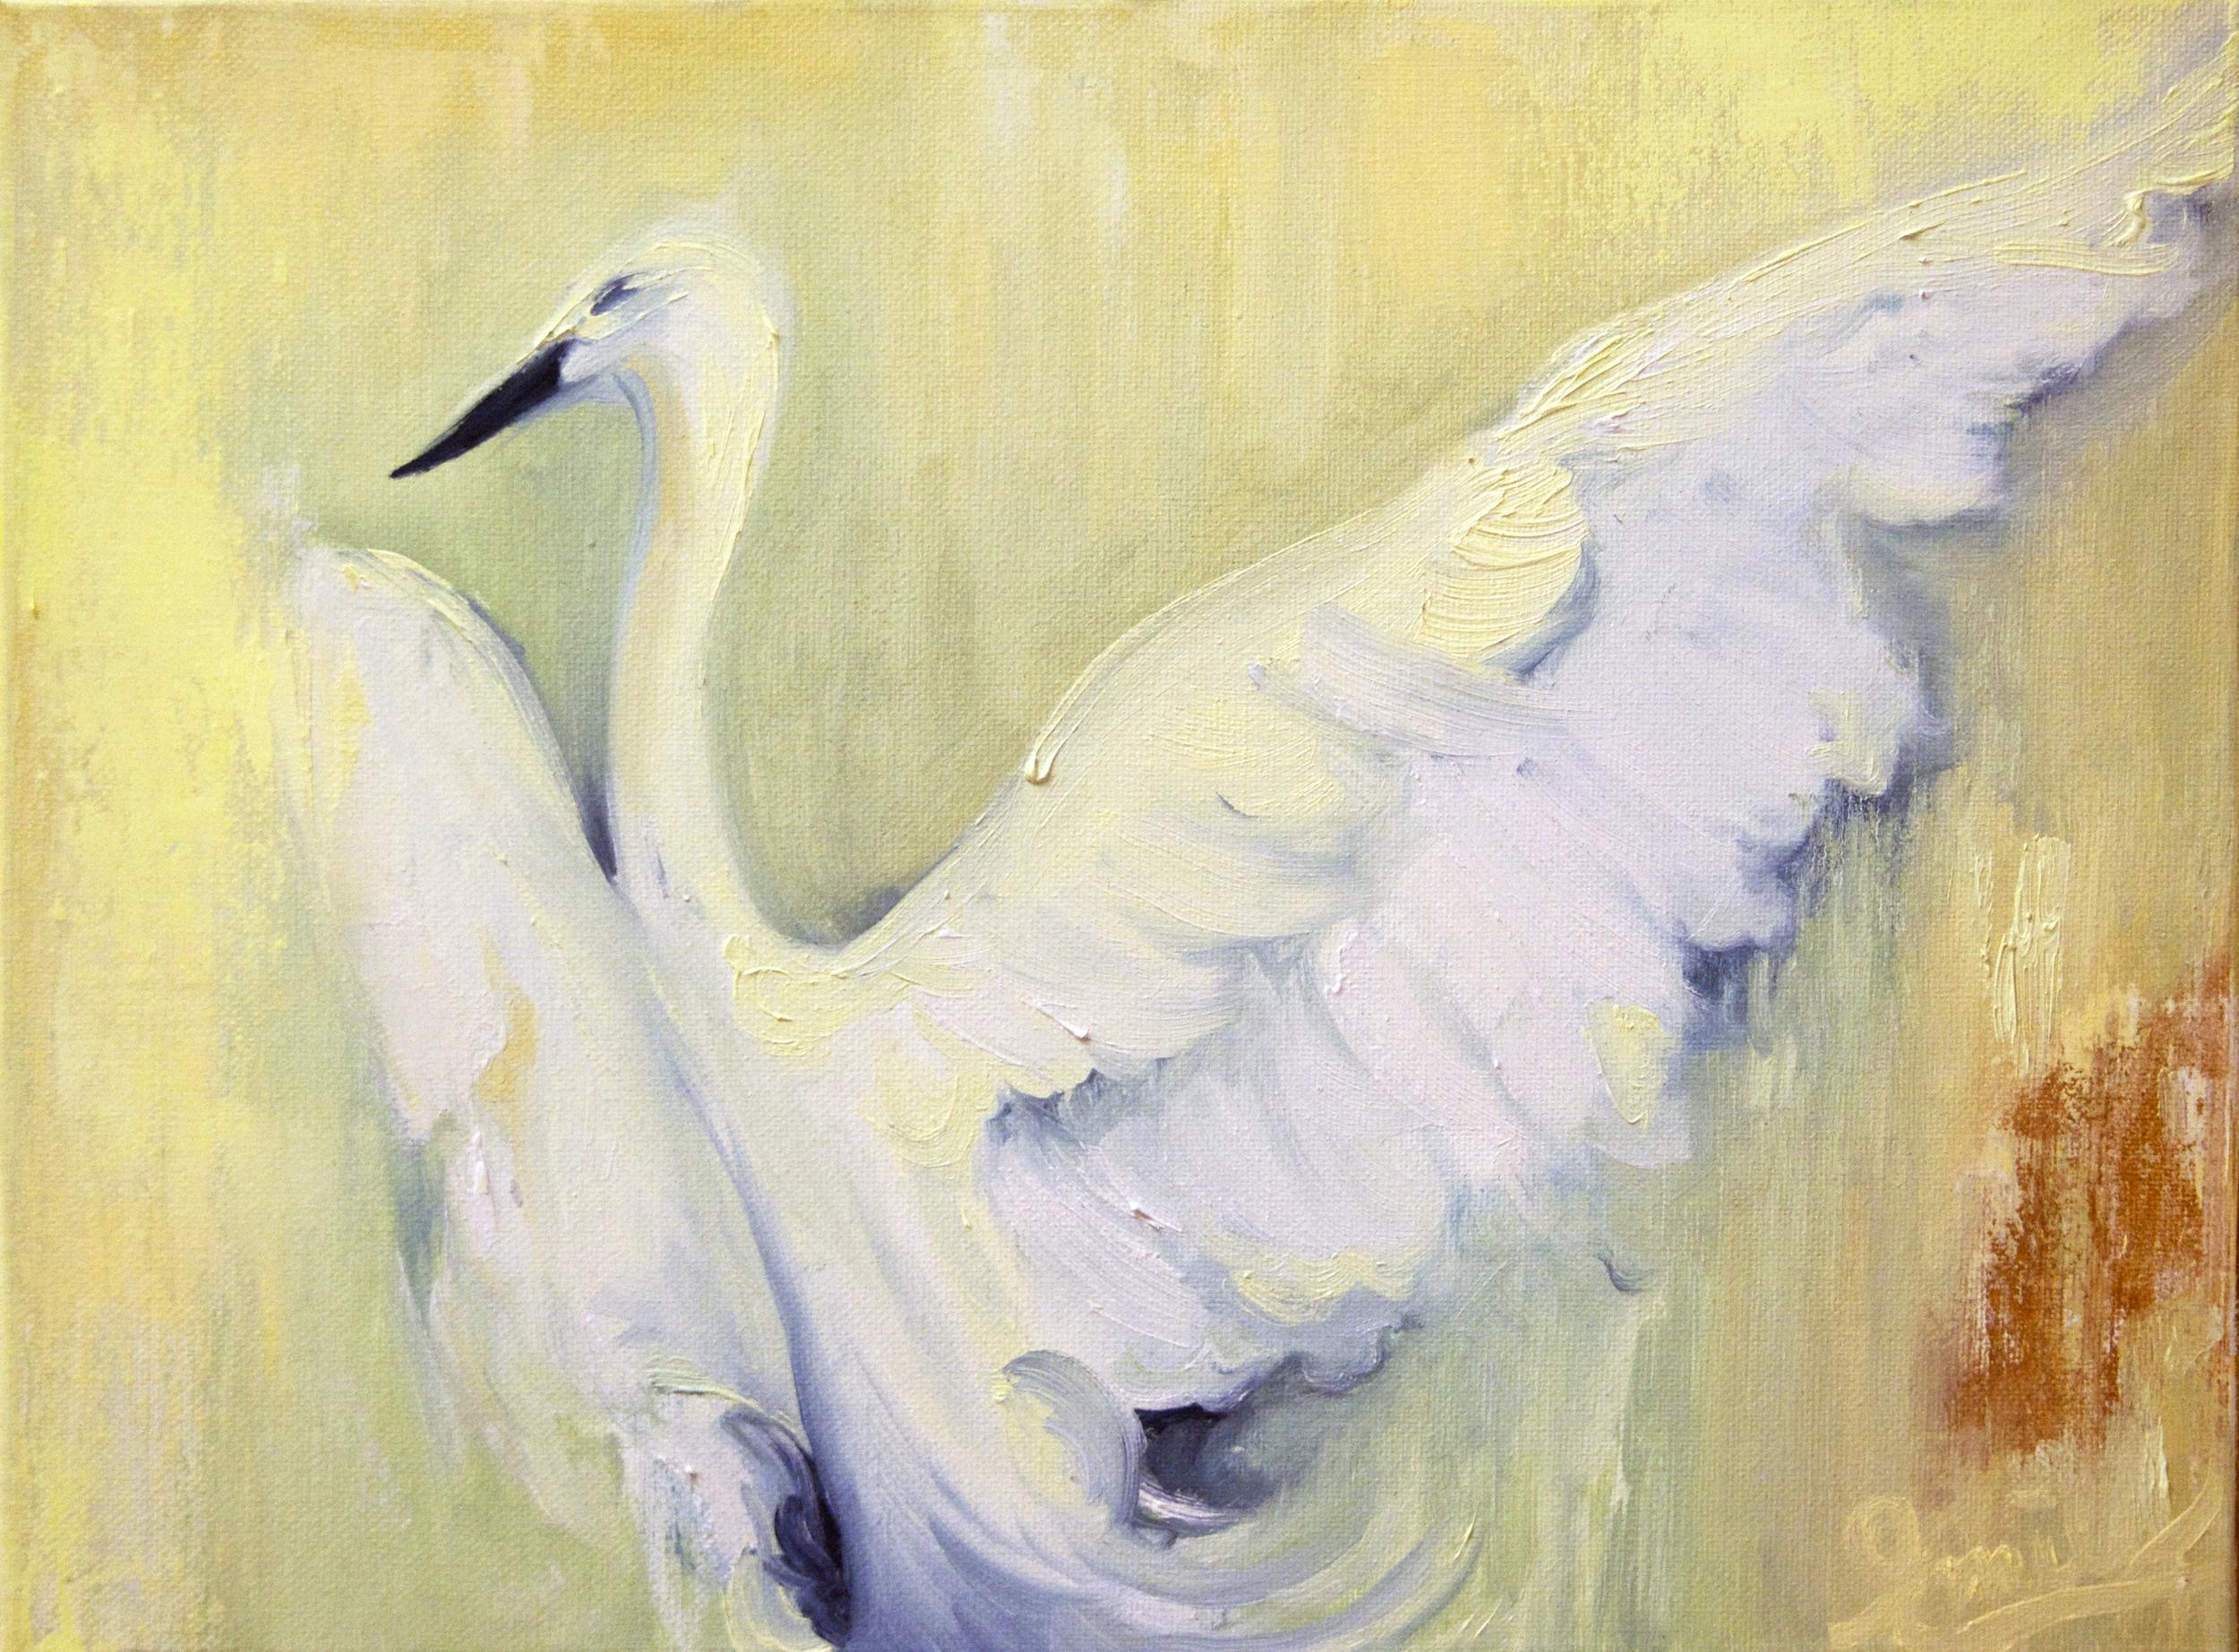 'Plume Dance', oil on canvas